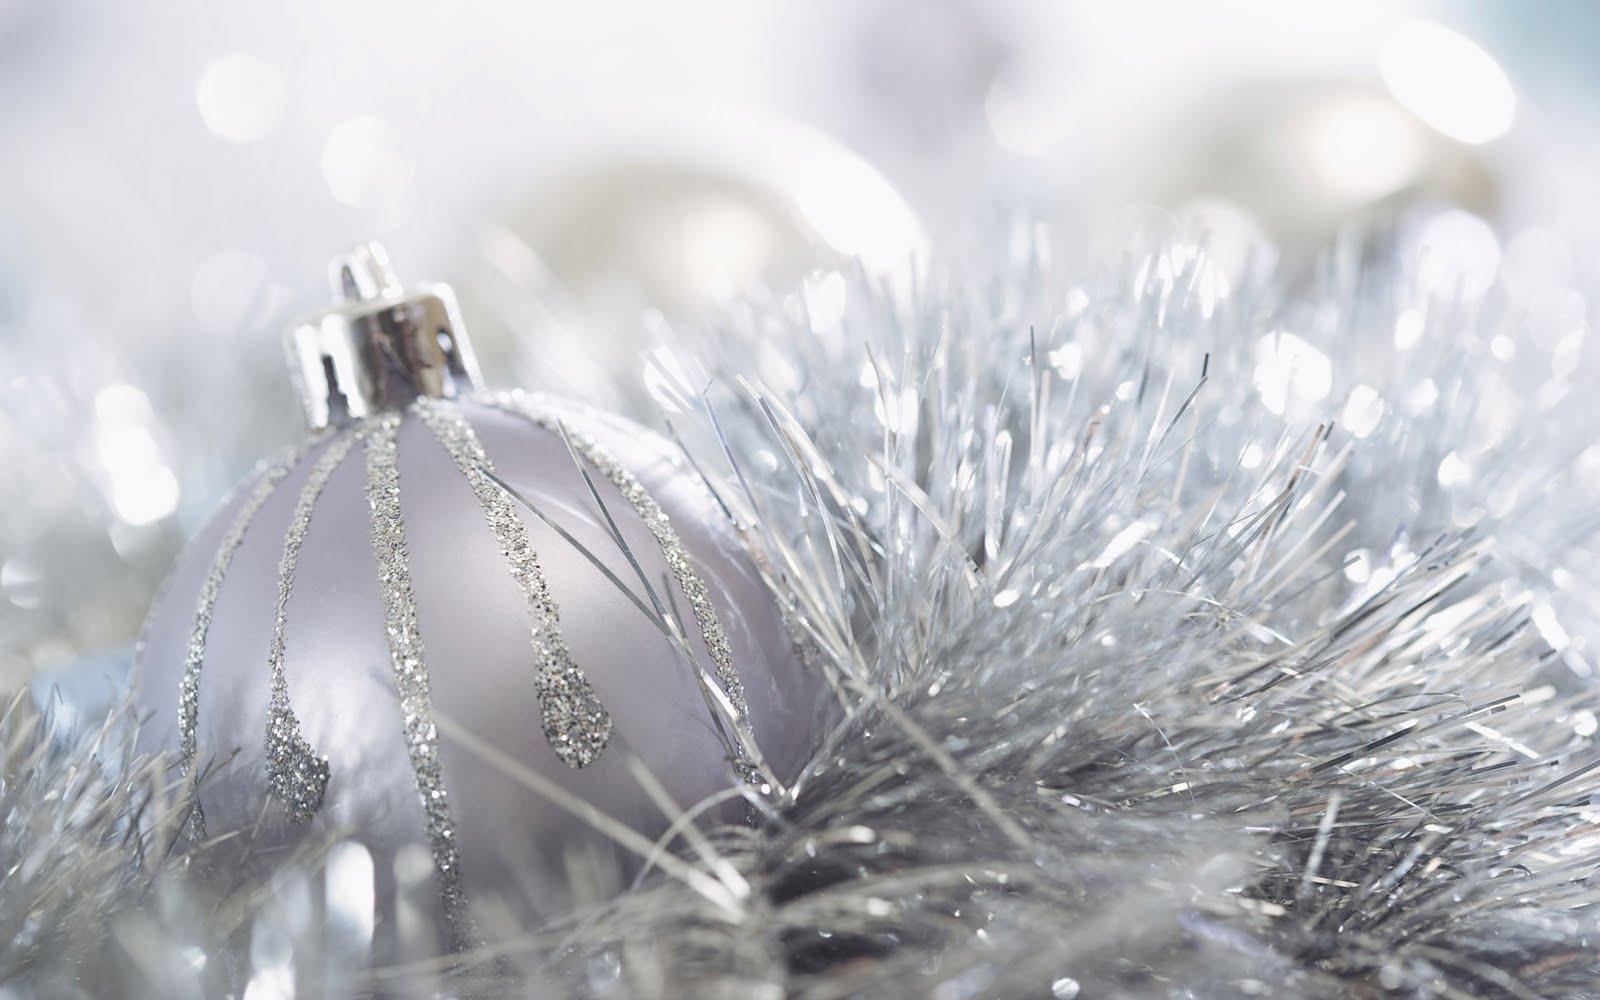 http://4.bp.blogspot.com/_0fvCOMn2z78/TGJp2uylwNI/AAAAAAAAD_M/8pKGYP2zYTI/s1600/Wallpaper.+White+Christmas.JPG